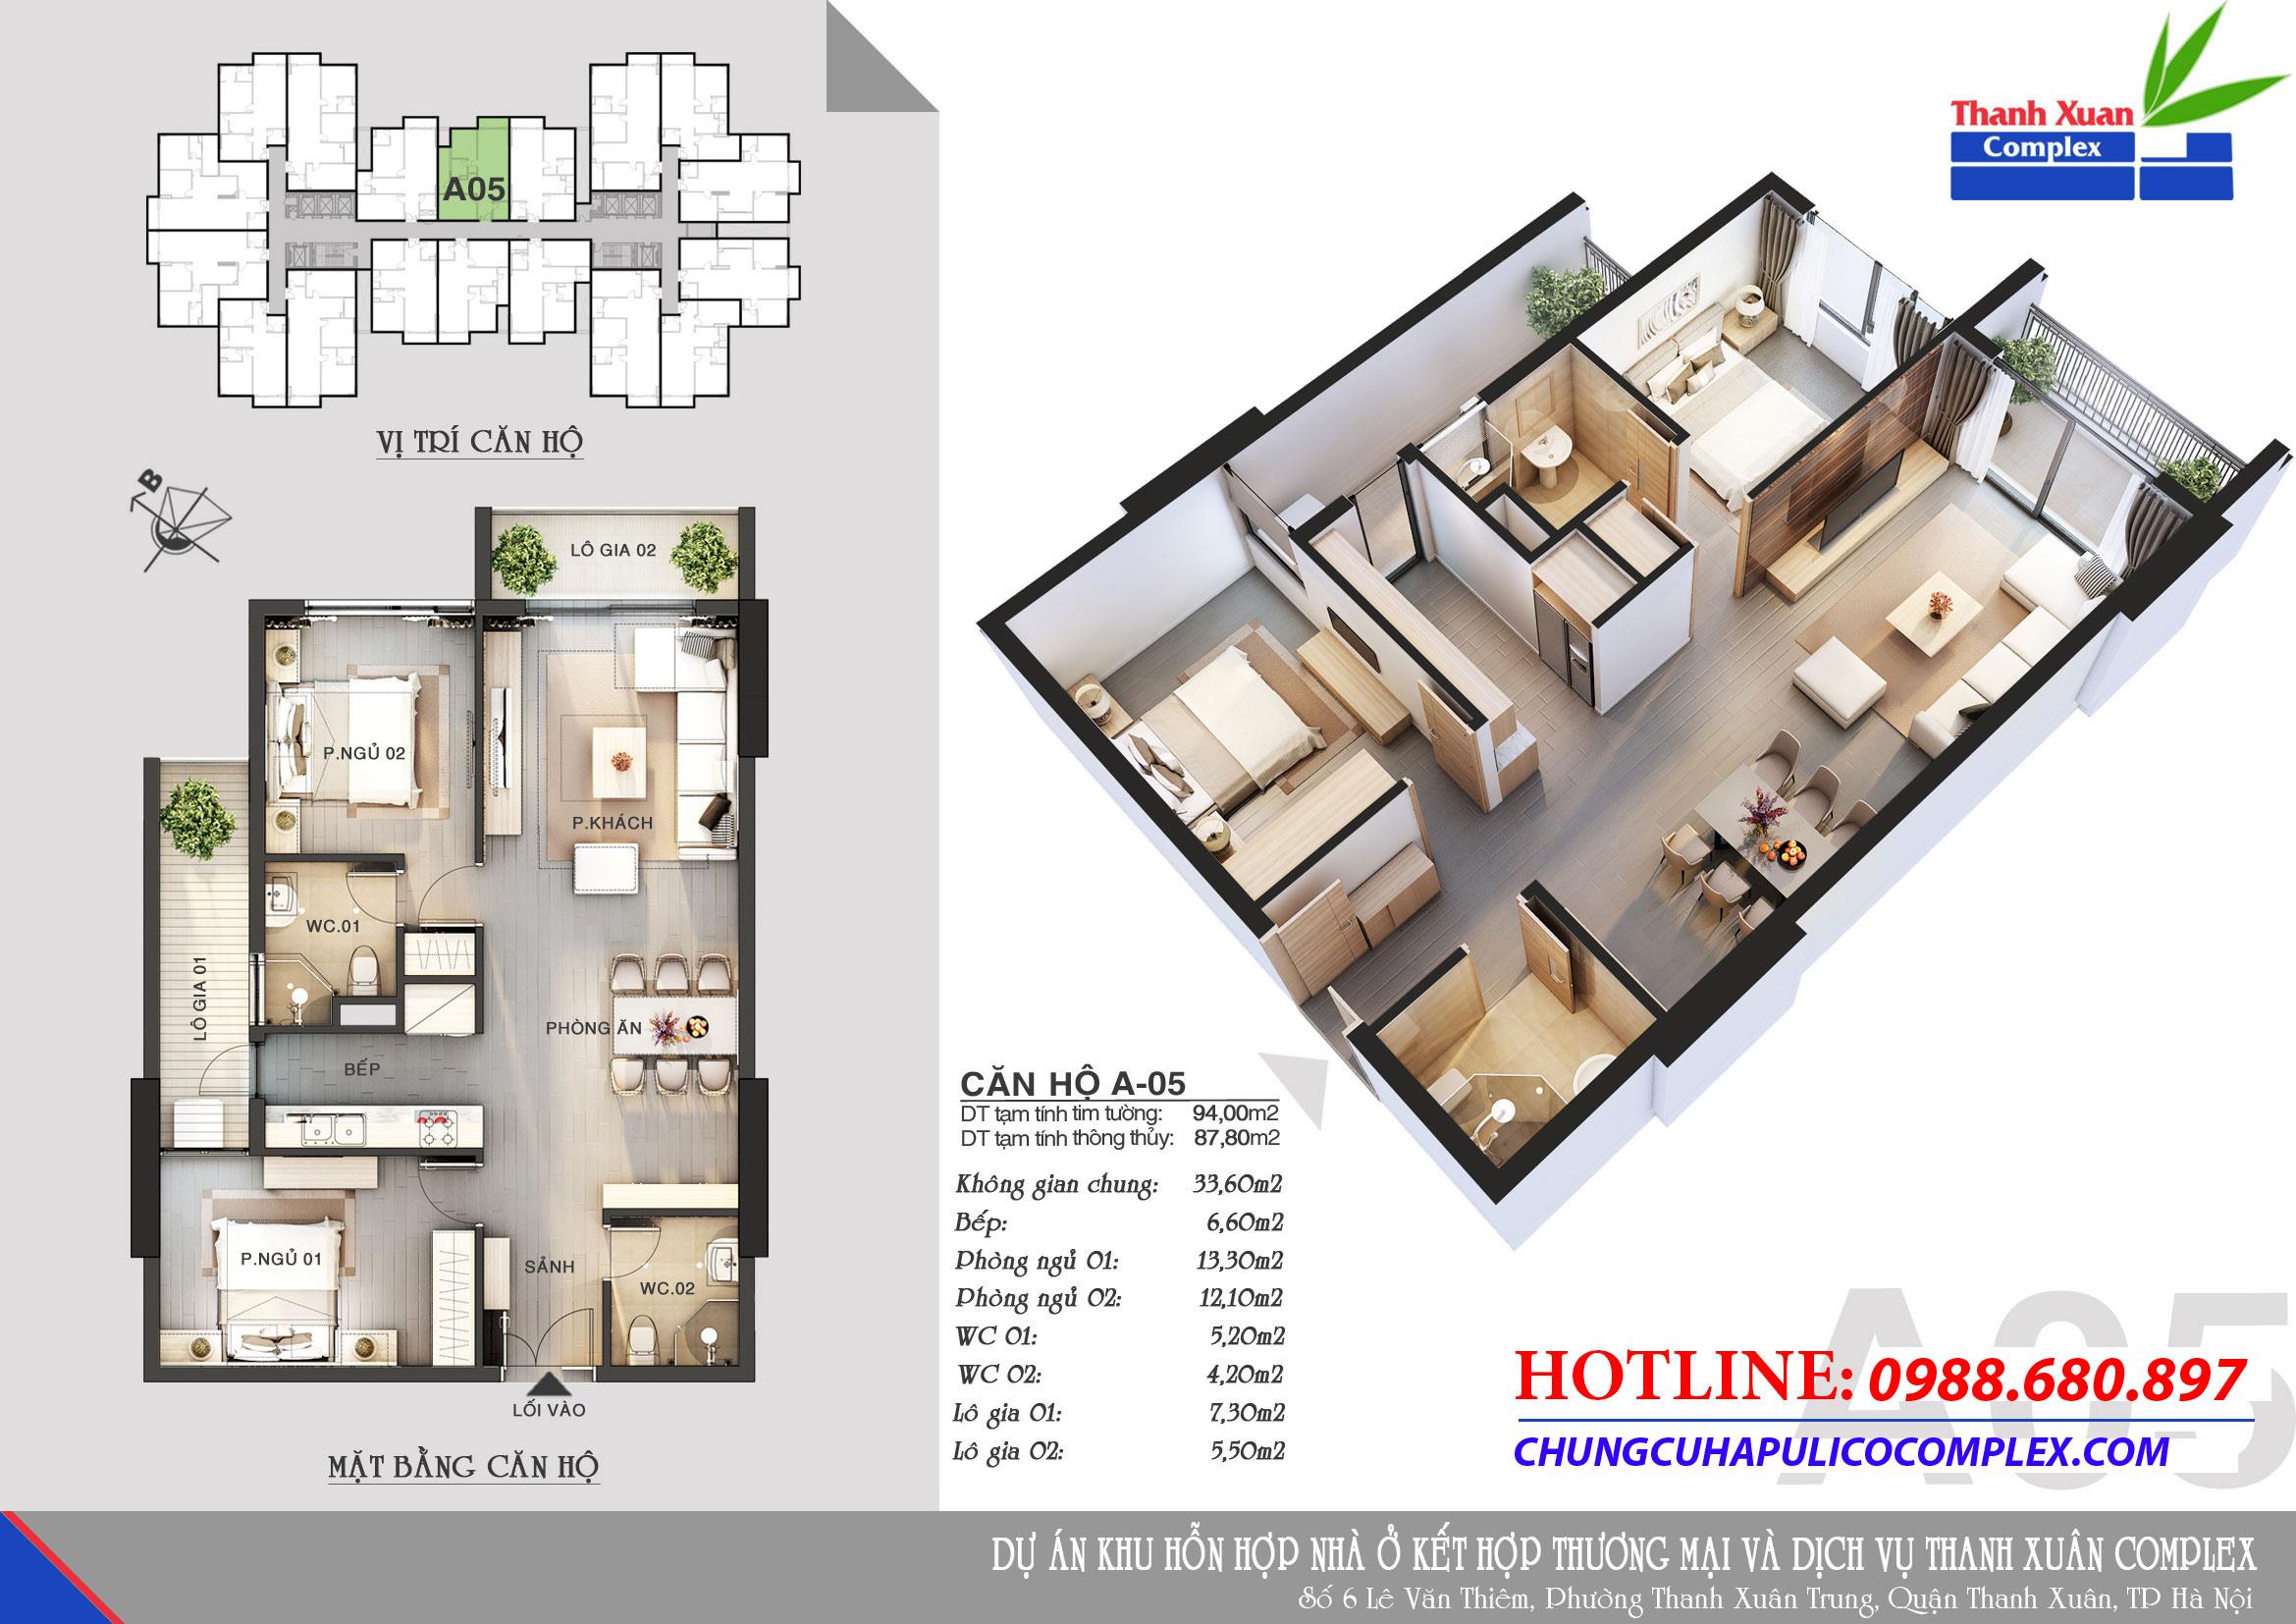 HSB_Thanhxuan-complex_CH-A05_suachotT42016-copy